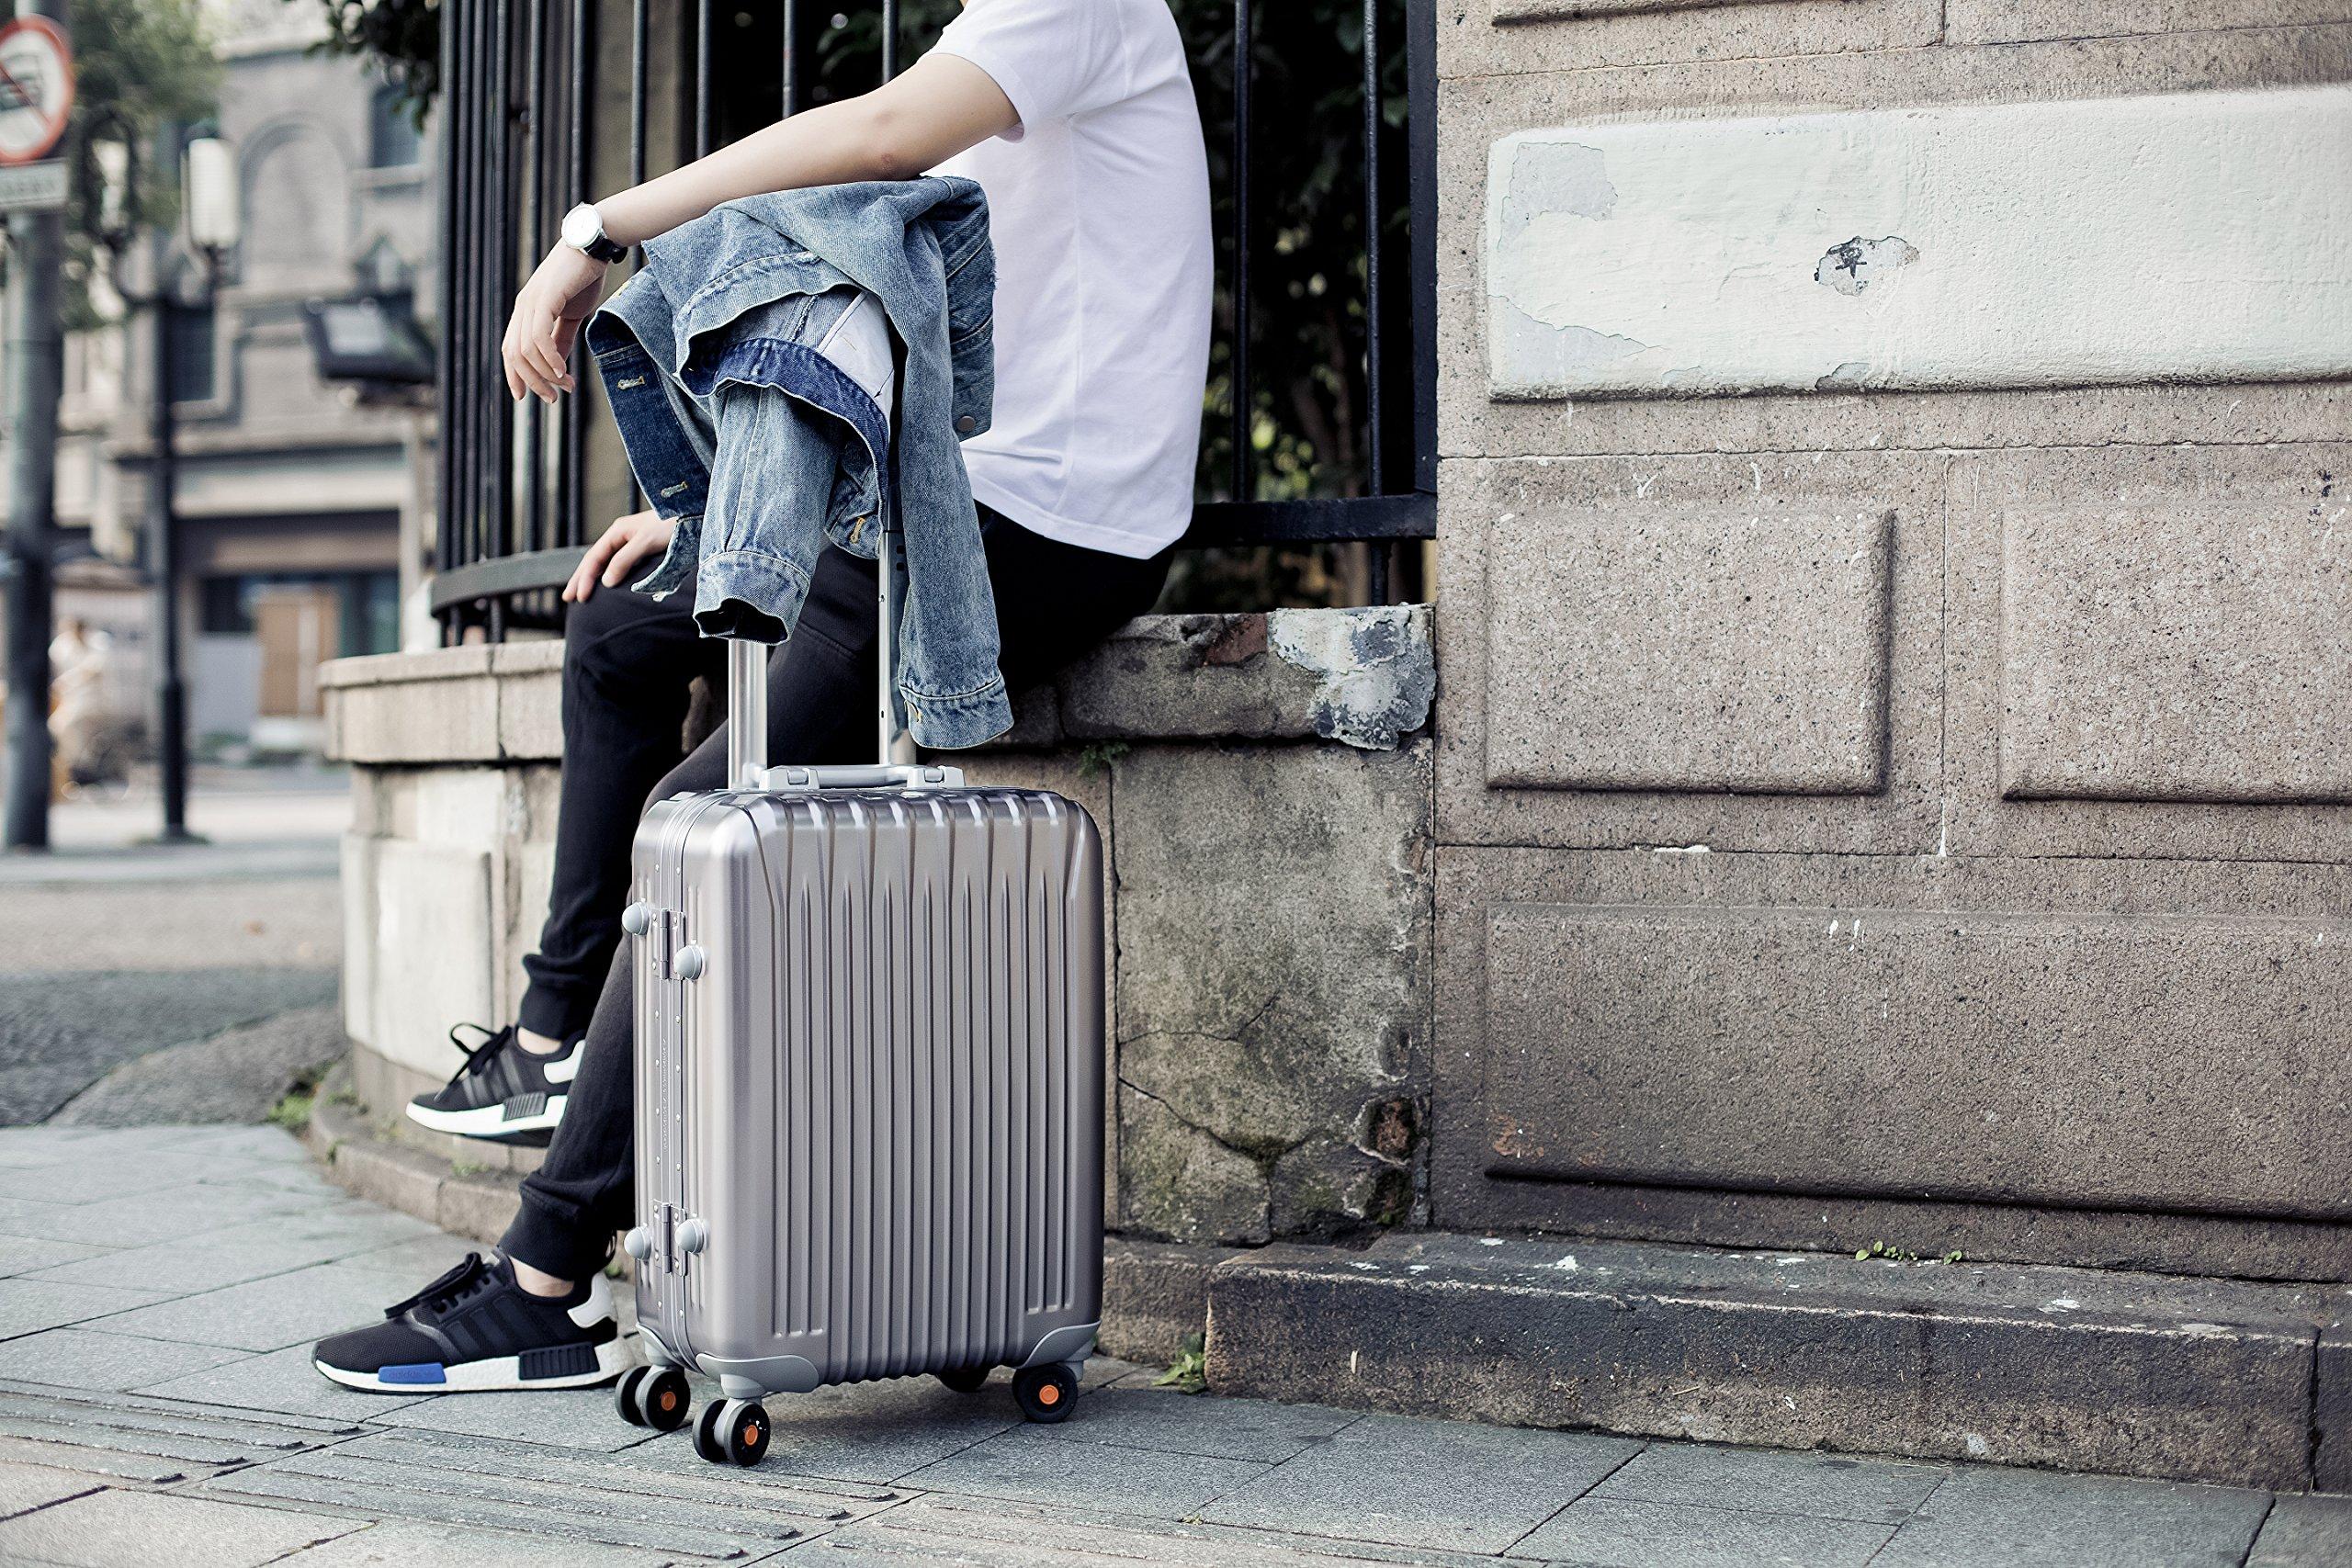 All Aluminum Luggage, HardShell Carry On Spinner Suitcase Grade 5 Aluminum-Magnesium Alloy TSA Approved 20'', Gunmetal by Clothink (Image #6)